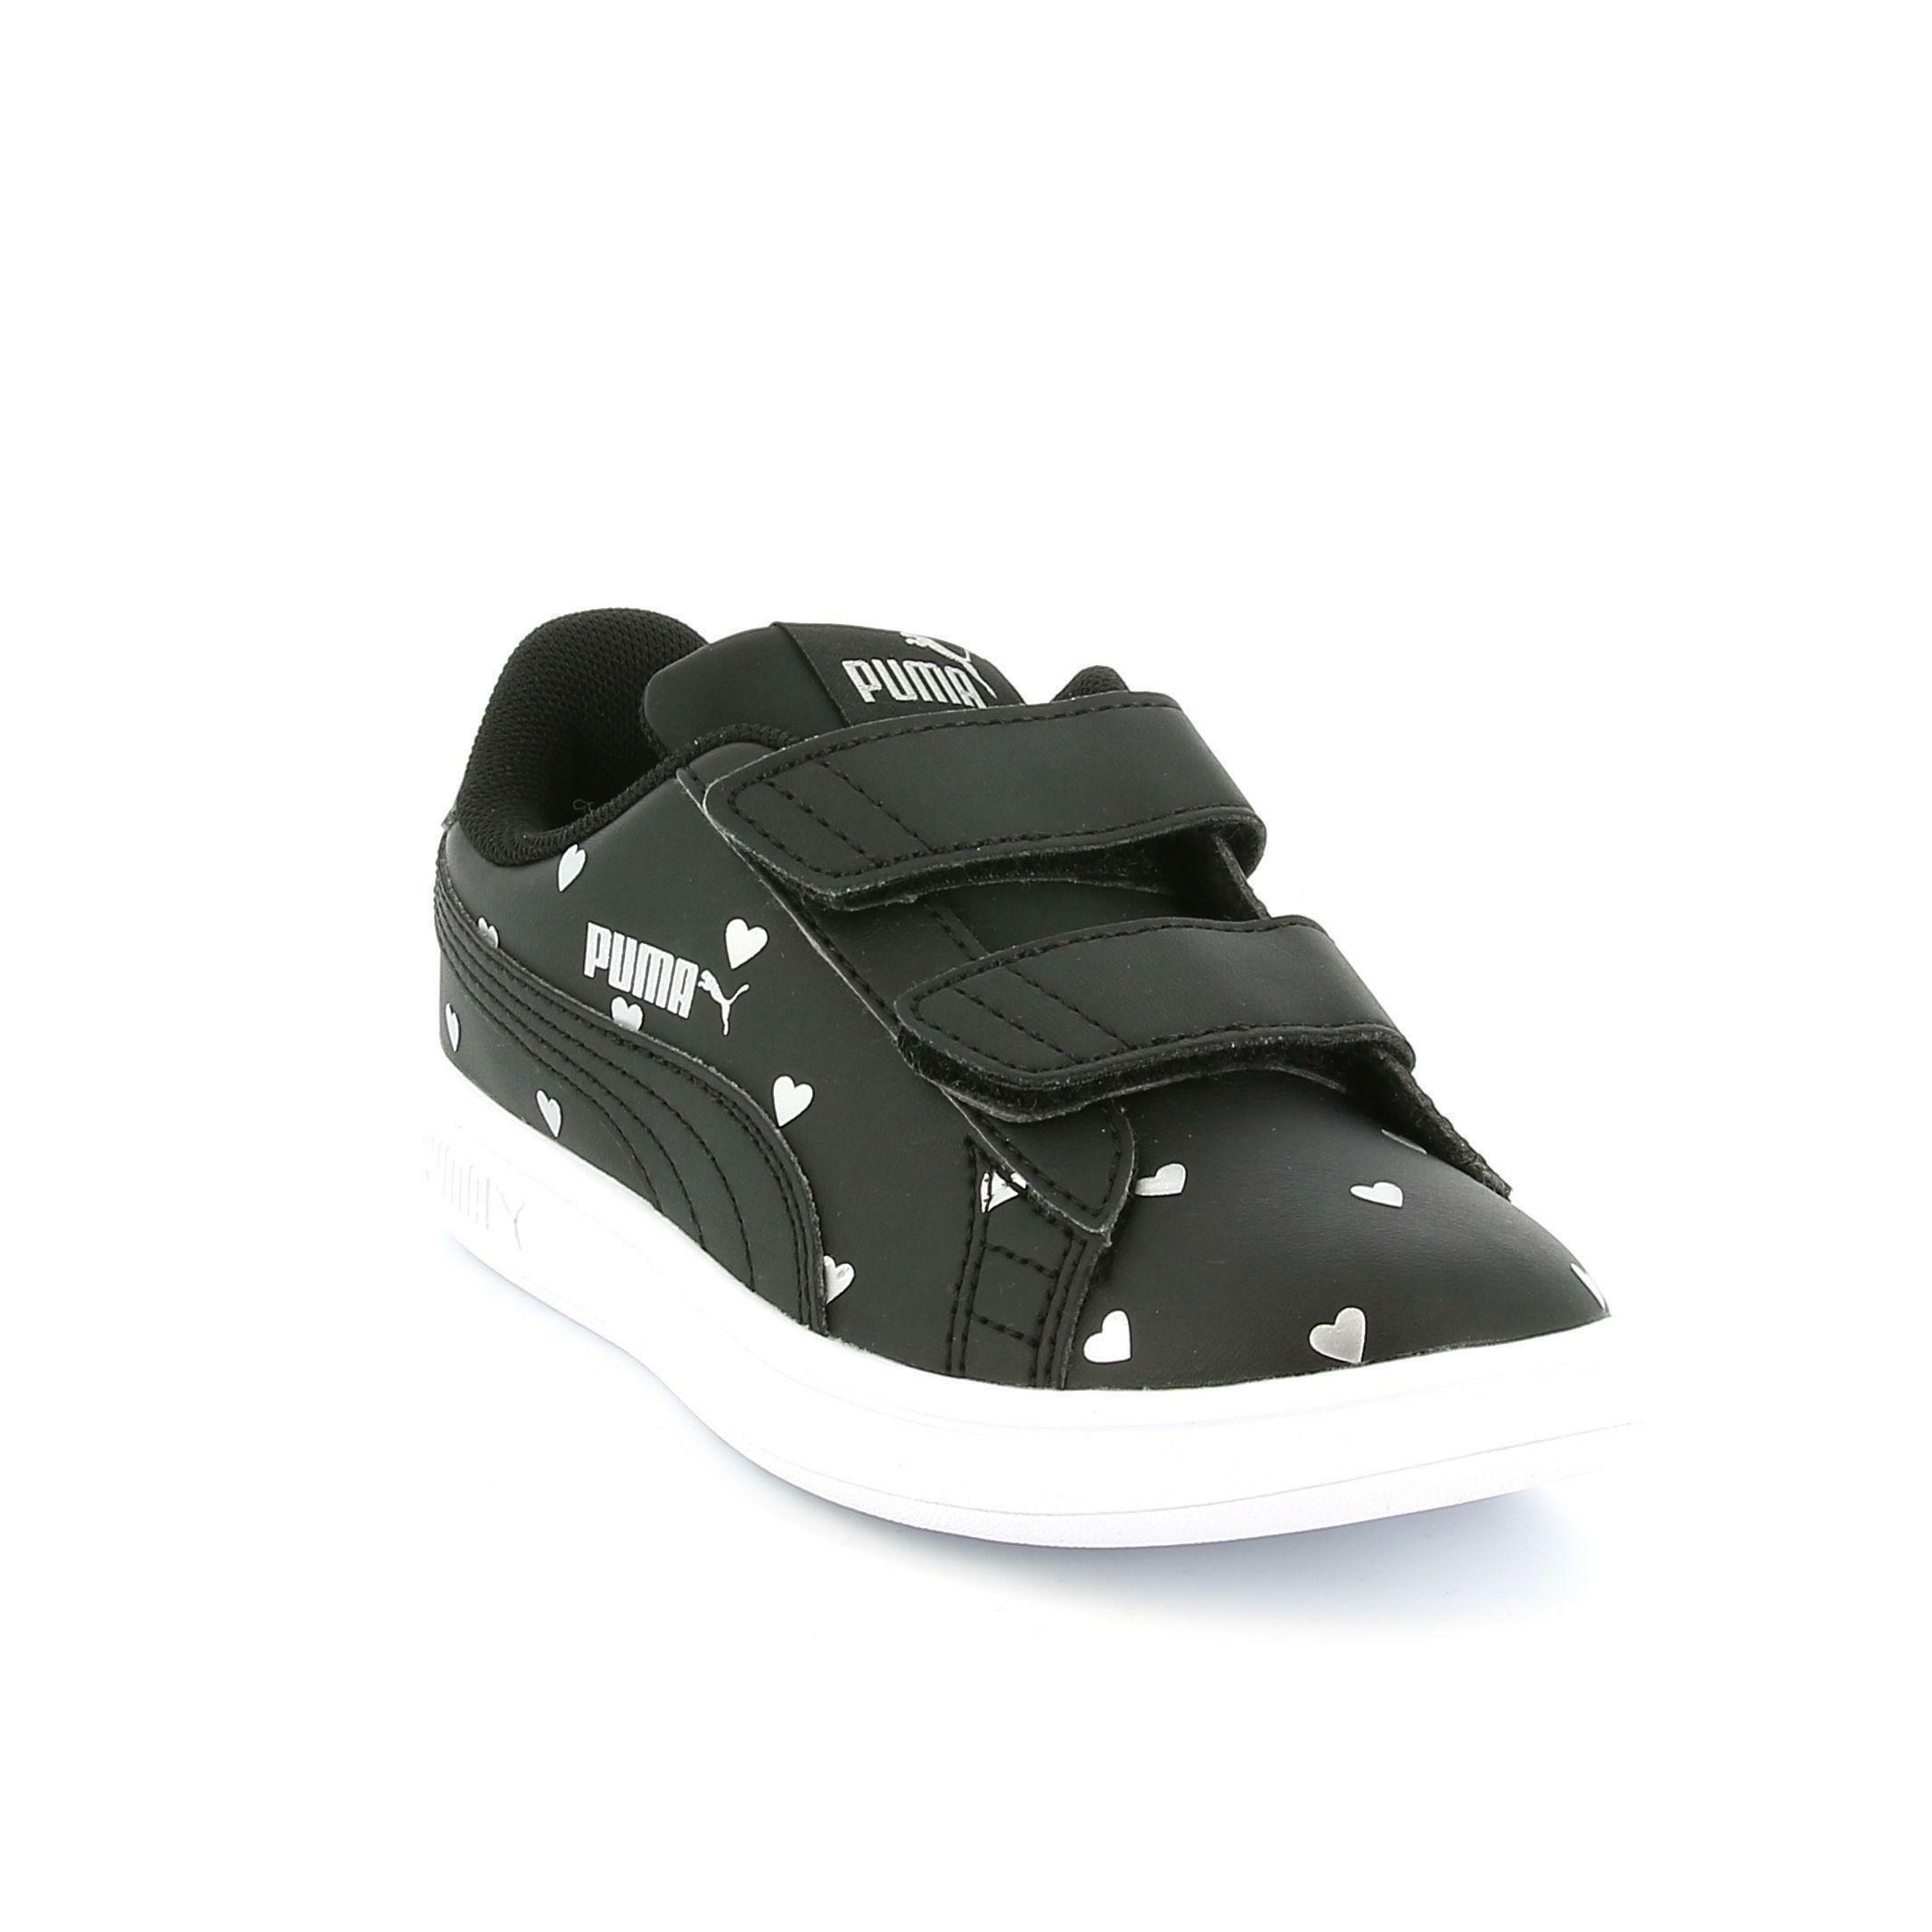 puma puma smash v2 l studs v inf bambina 374845 001 nero sneakers